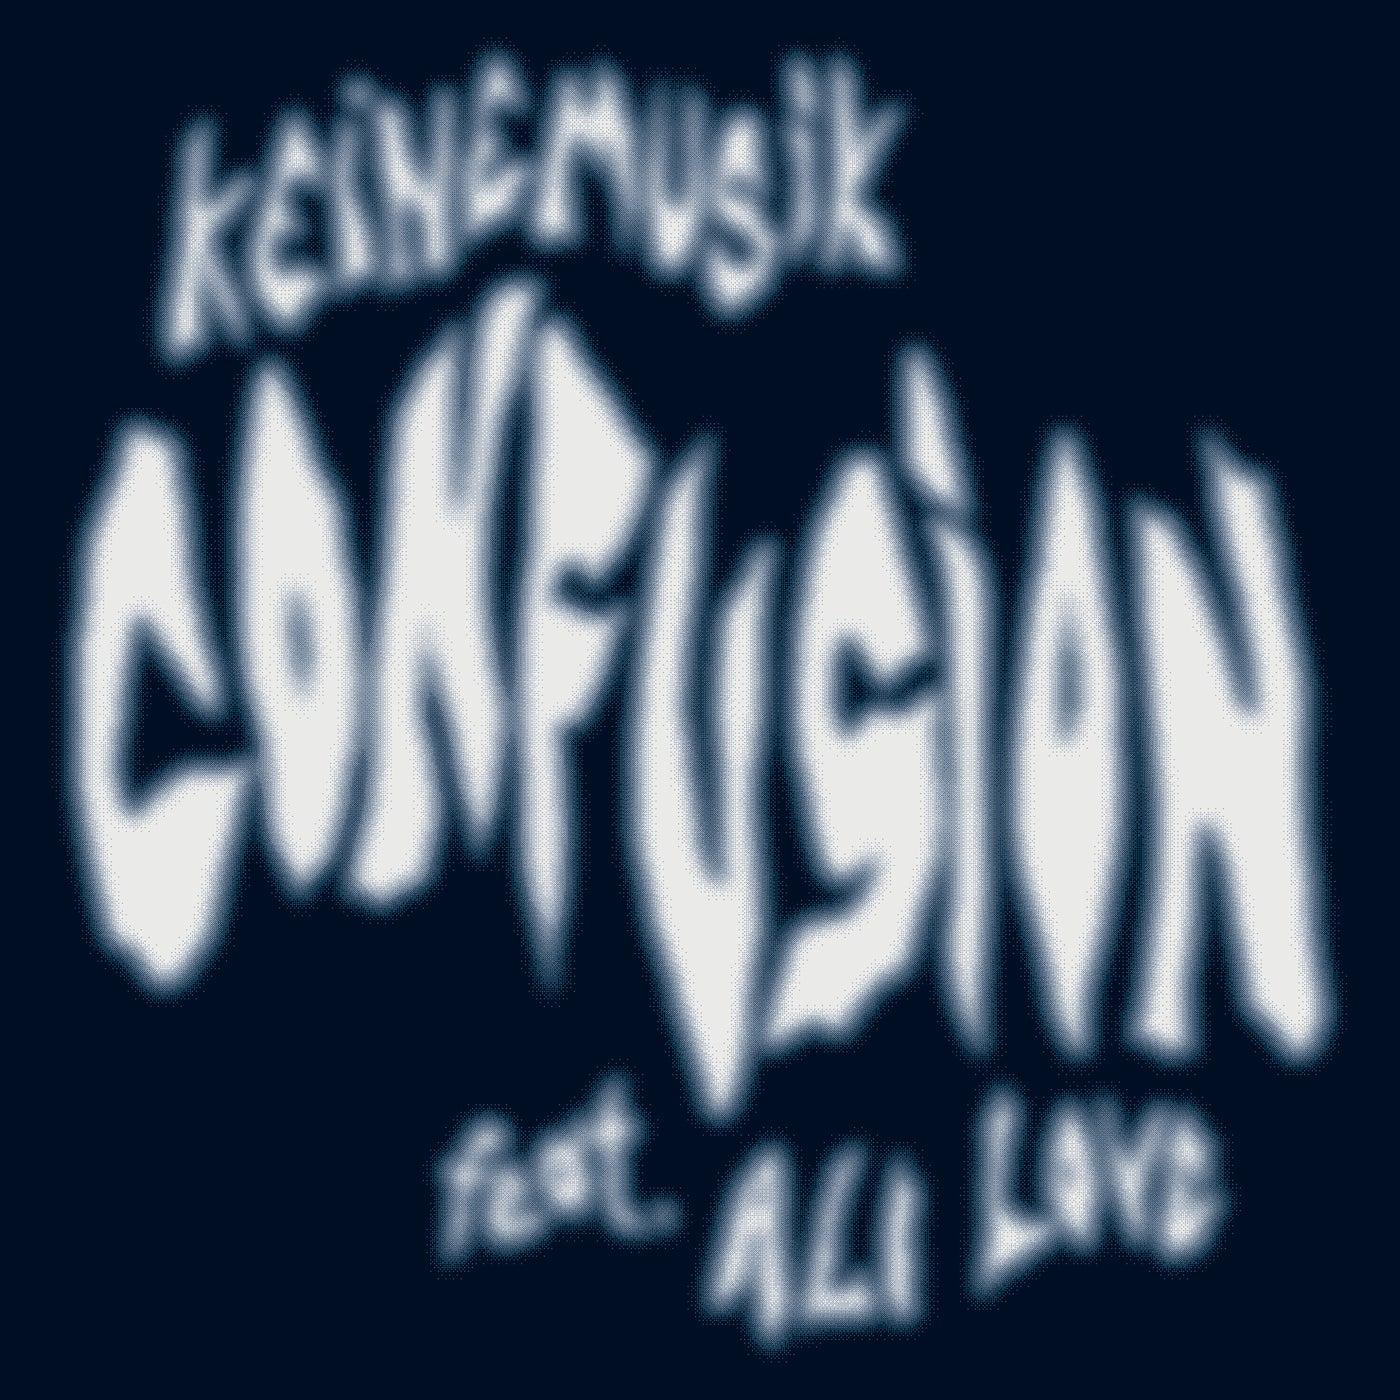 Confusion (Original Mix)